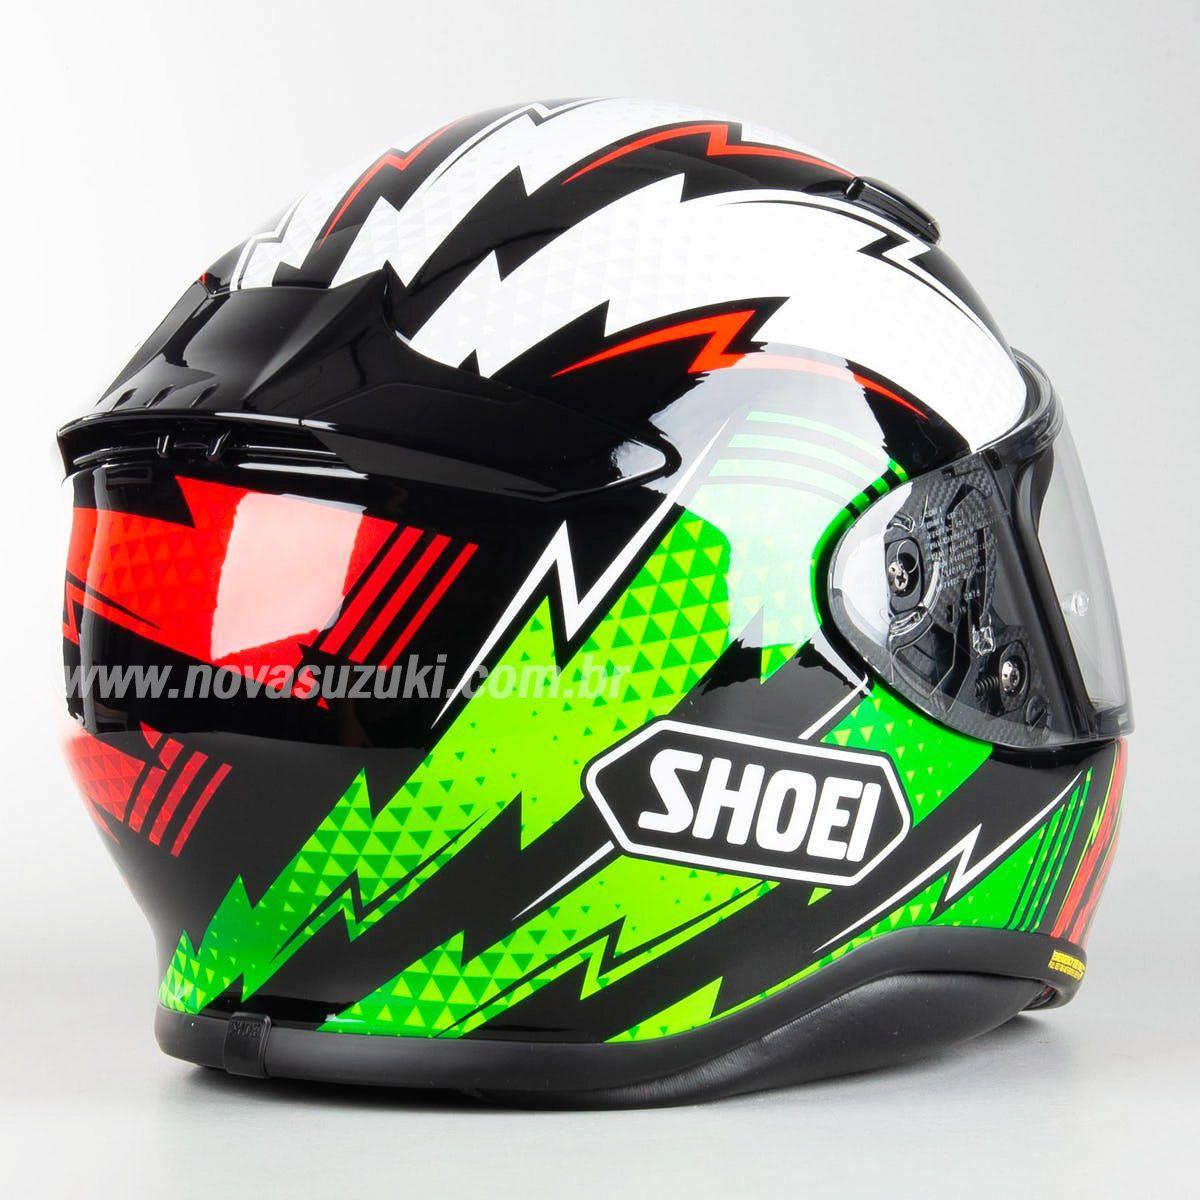 Capacete Shoei NXR Variable TC-4 para Esportivas  - Nova Suzuki Motos e Acessórios